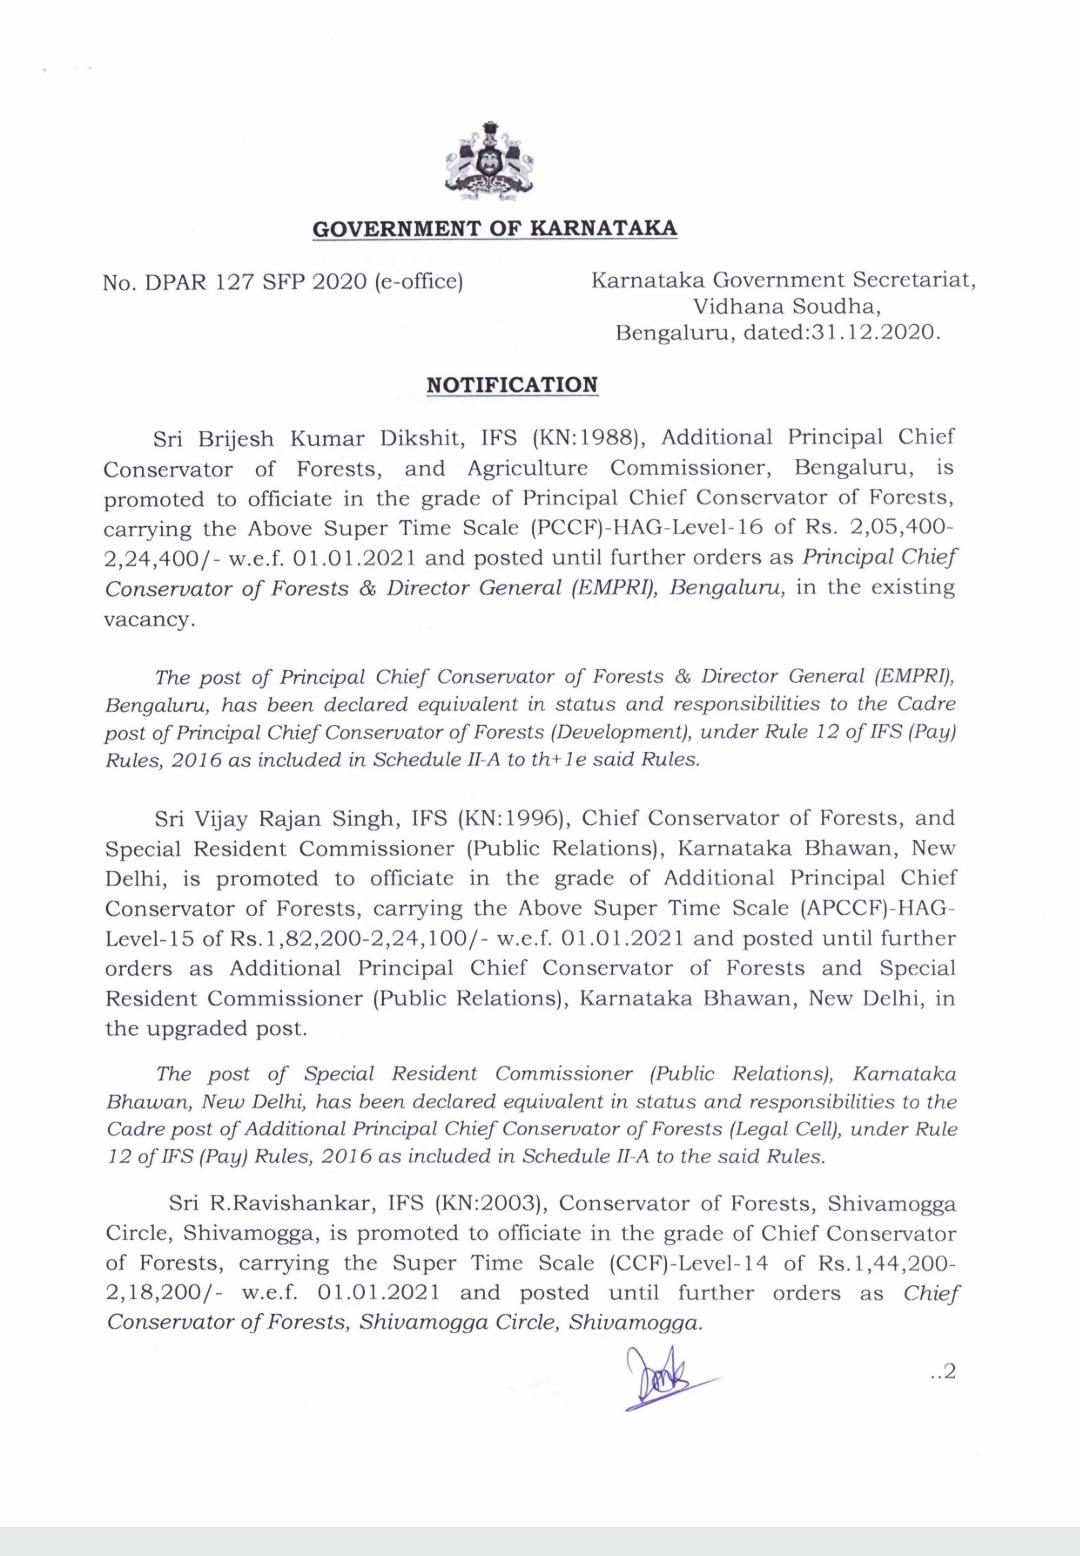 Transfer Order of Officers